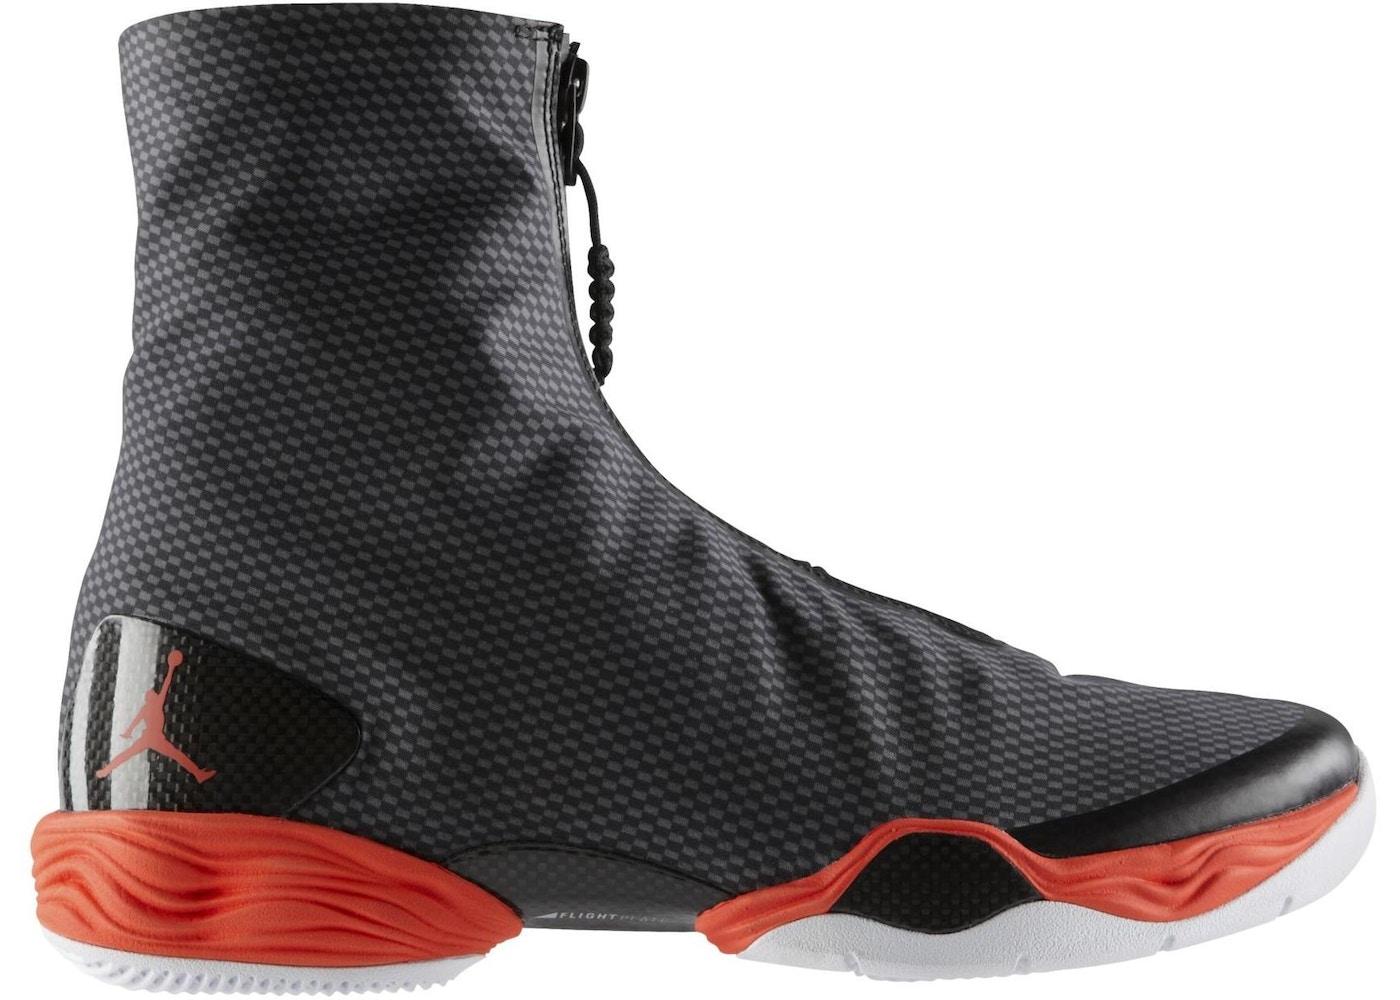 newest e286b 44315 Buy Air Jordan 28 Shoes & Deadstock Sneakers